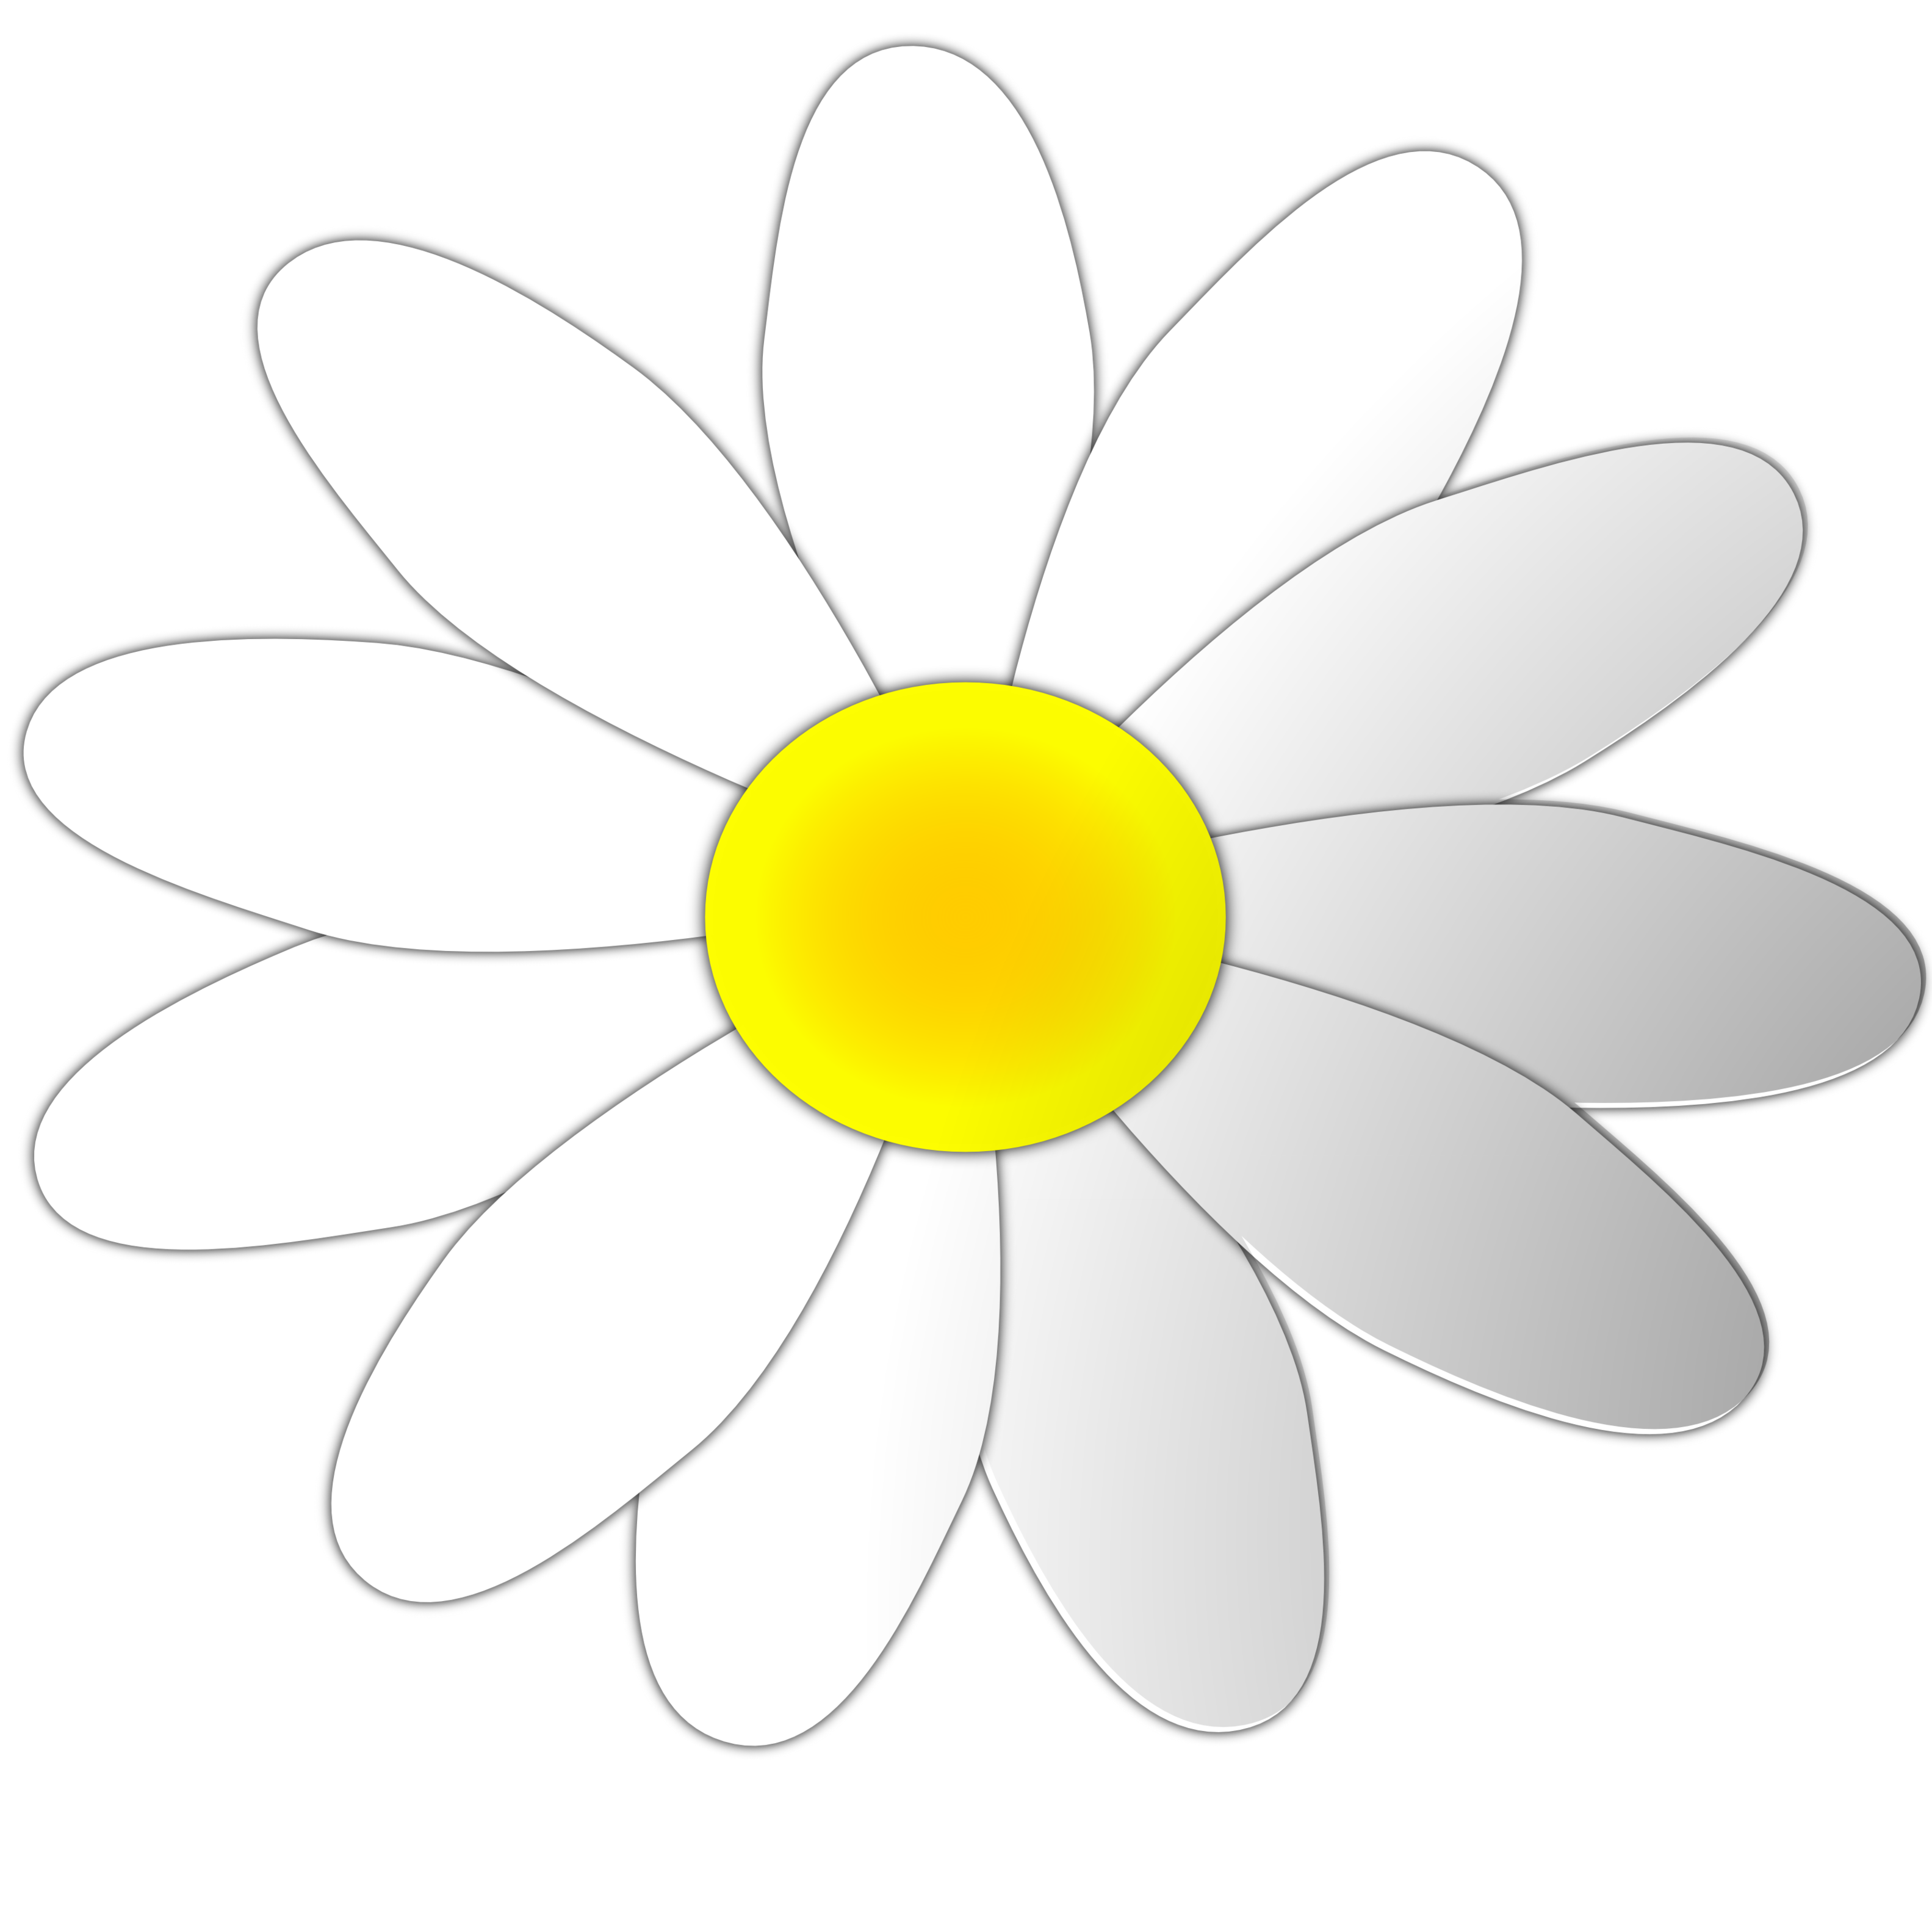 Daisy Flower Clipart. Valentine Daisy Flower 8 SVG